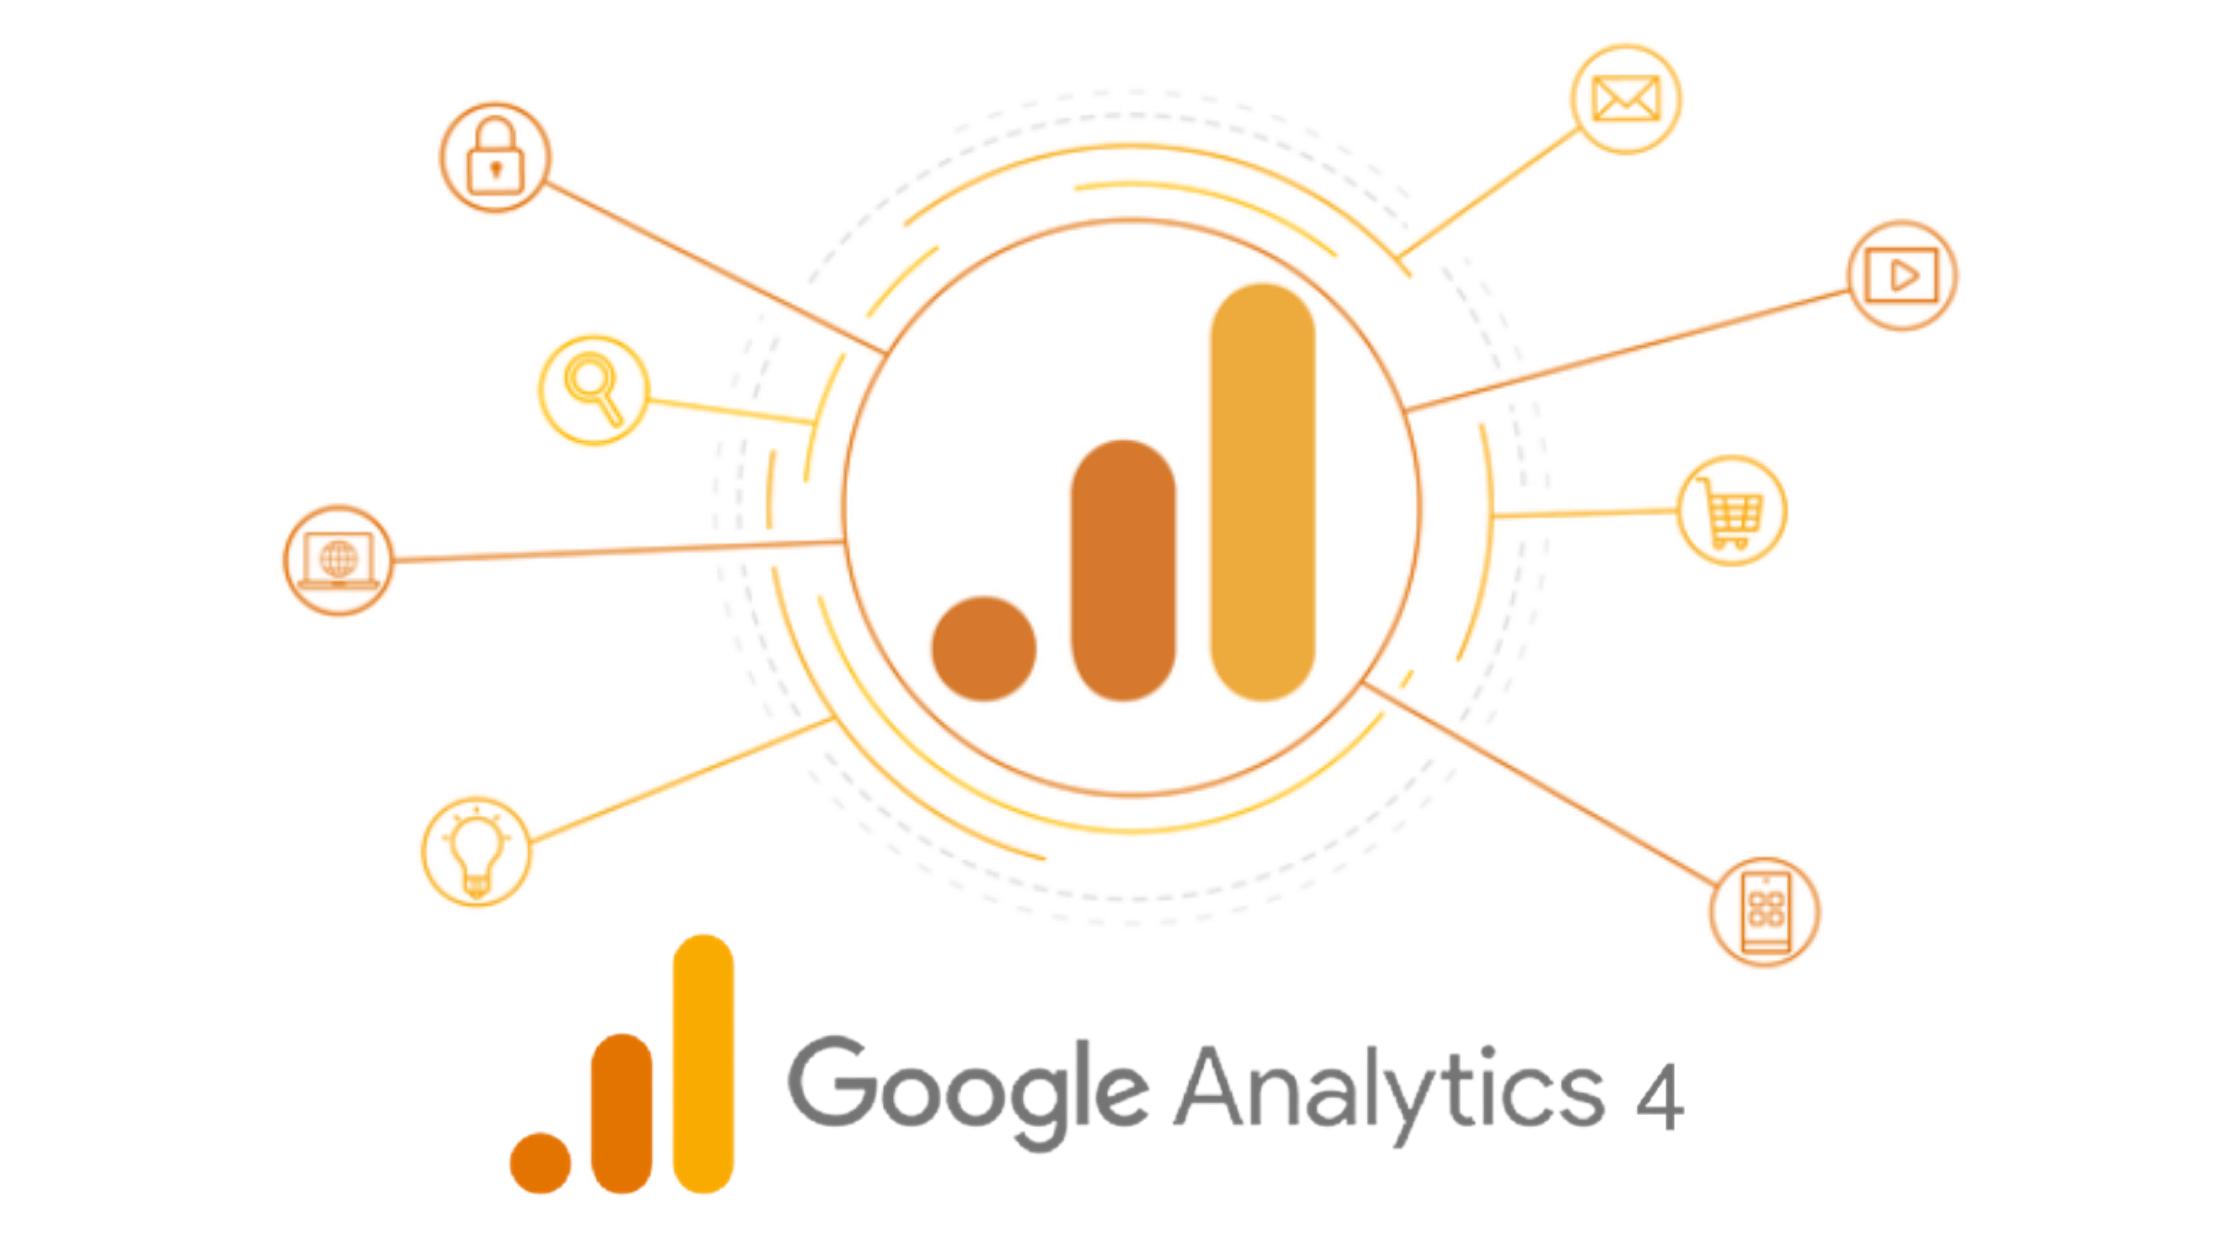 Google-Analytics-4 Αλλαγές και Νέες Τάσεις - Istopixida.gr